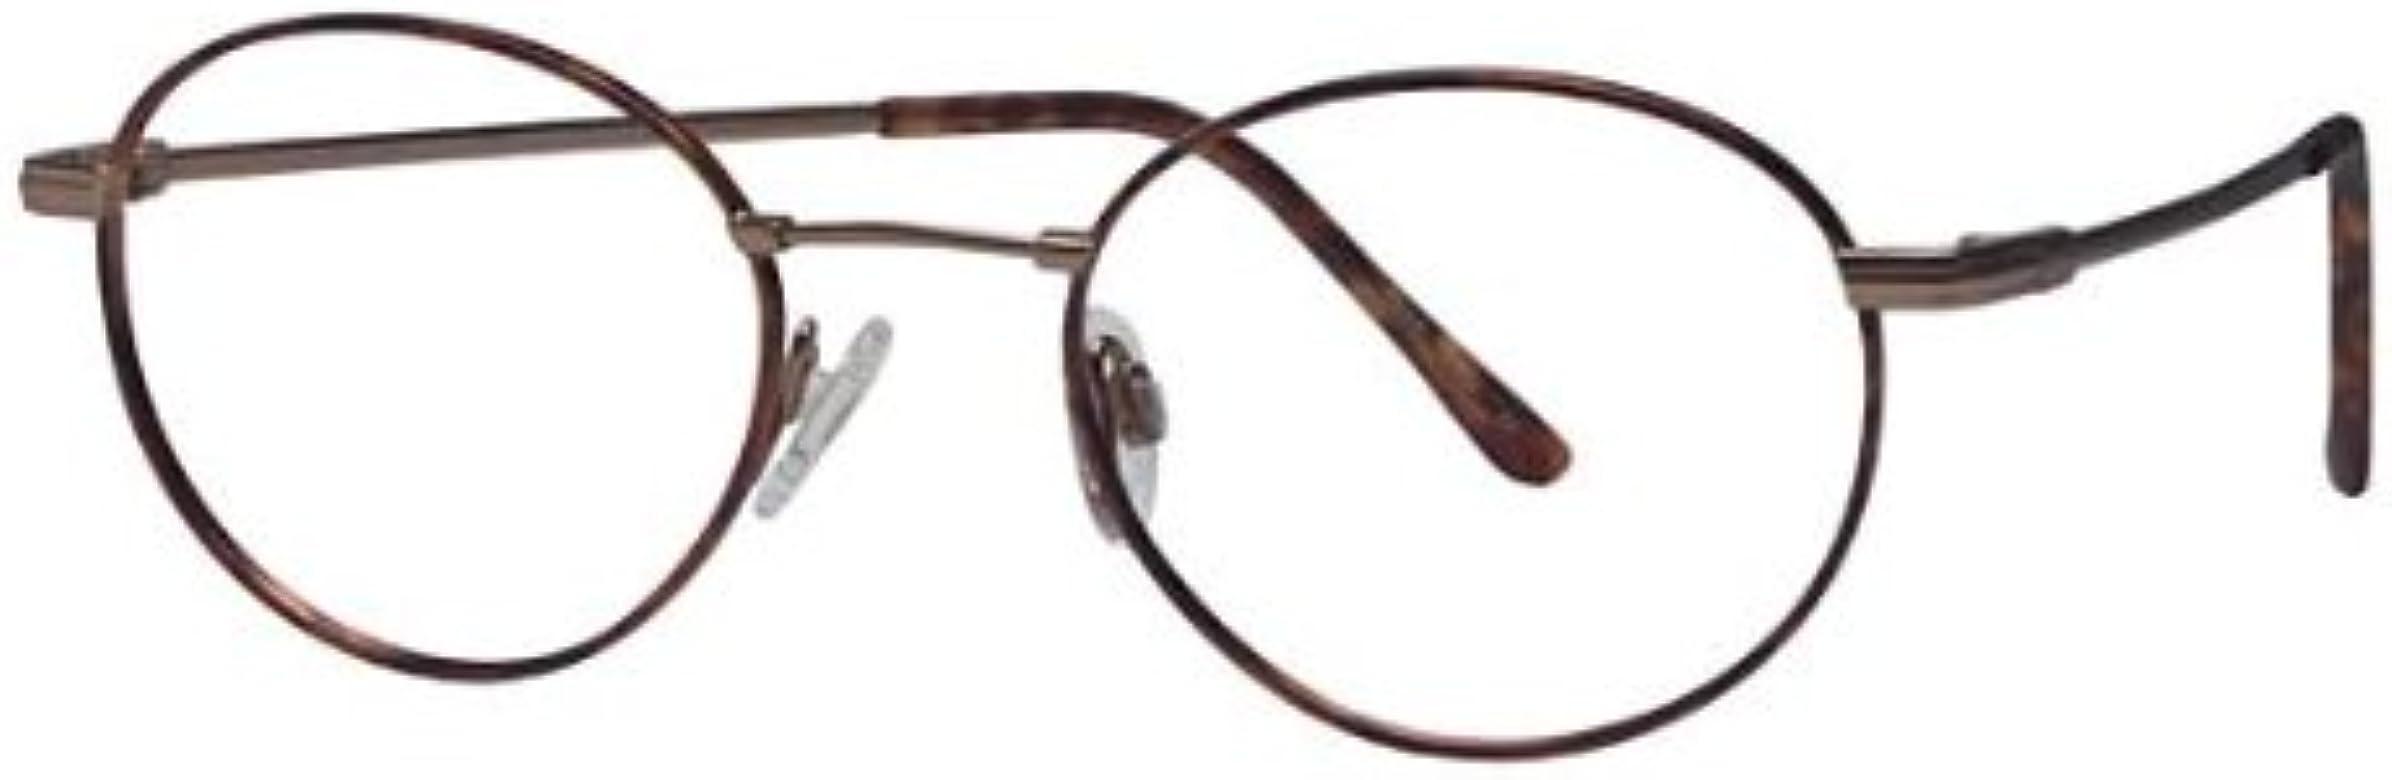 b692426dca12 Amazon.com: Flexon Autoflex 53 Eyeglasses 215 Tortoise/Bronze Demo 52 19  145: Clothing